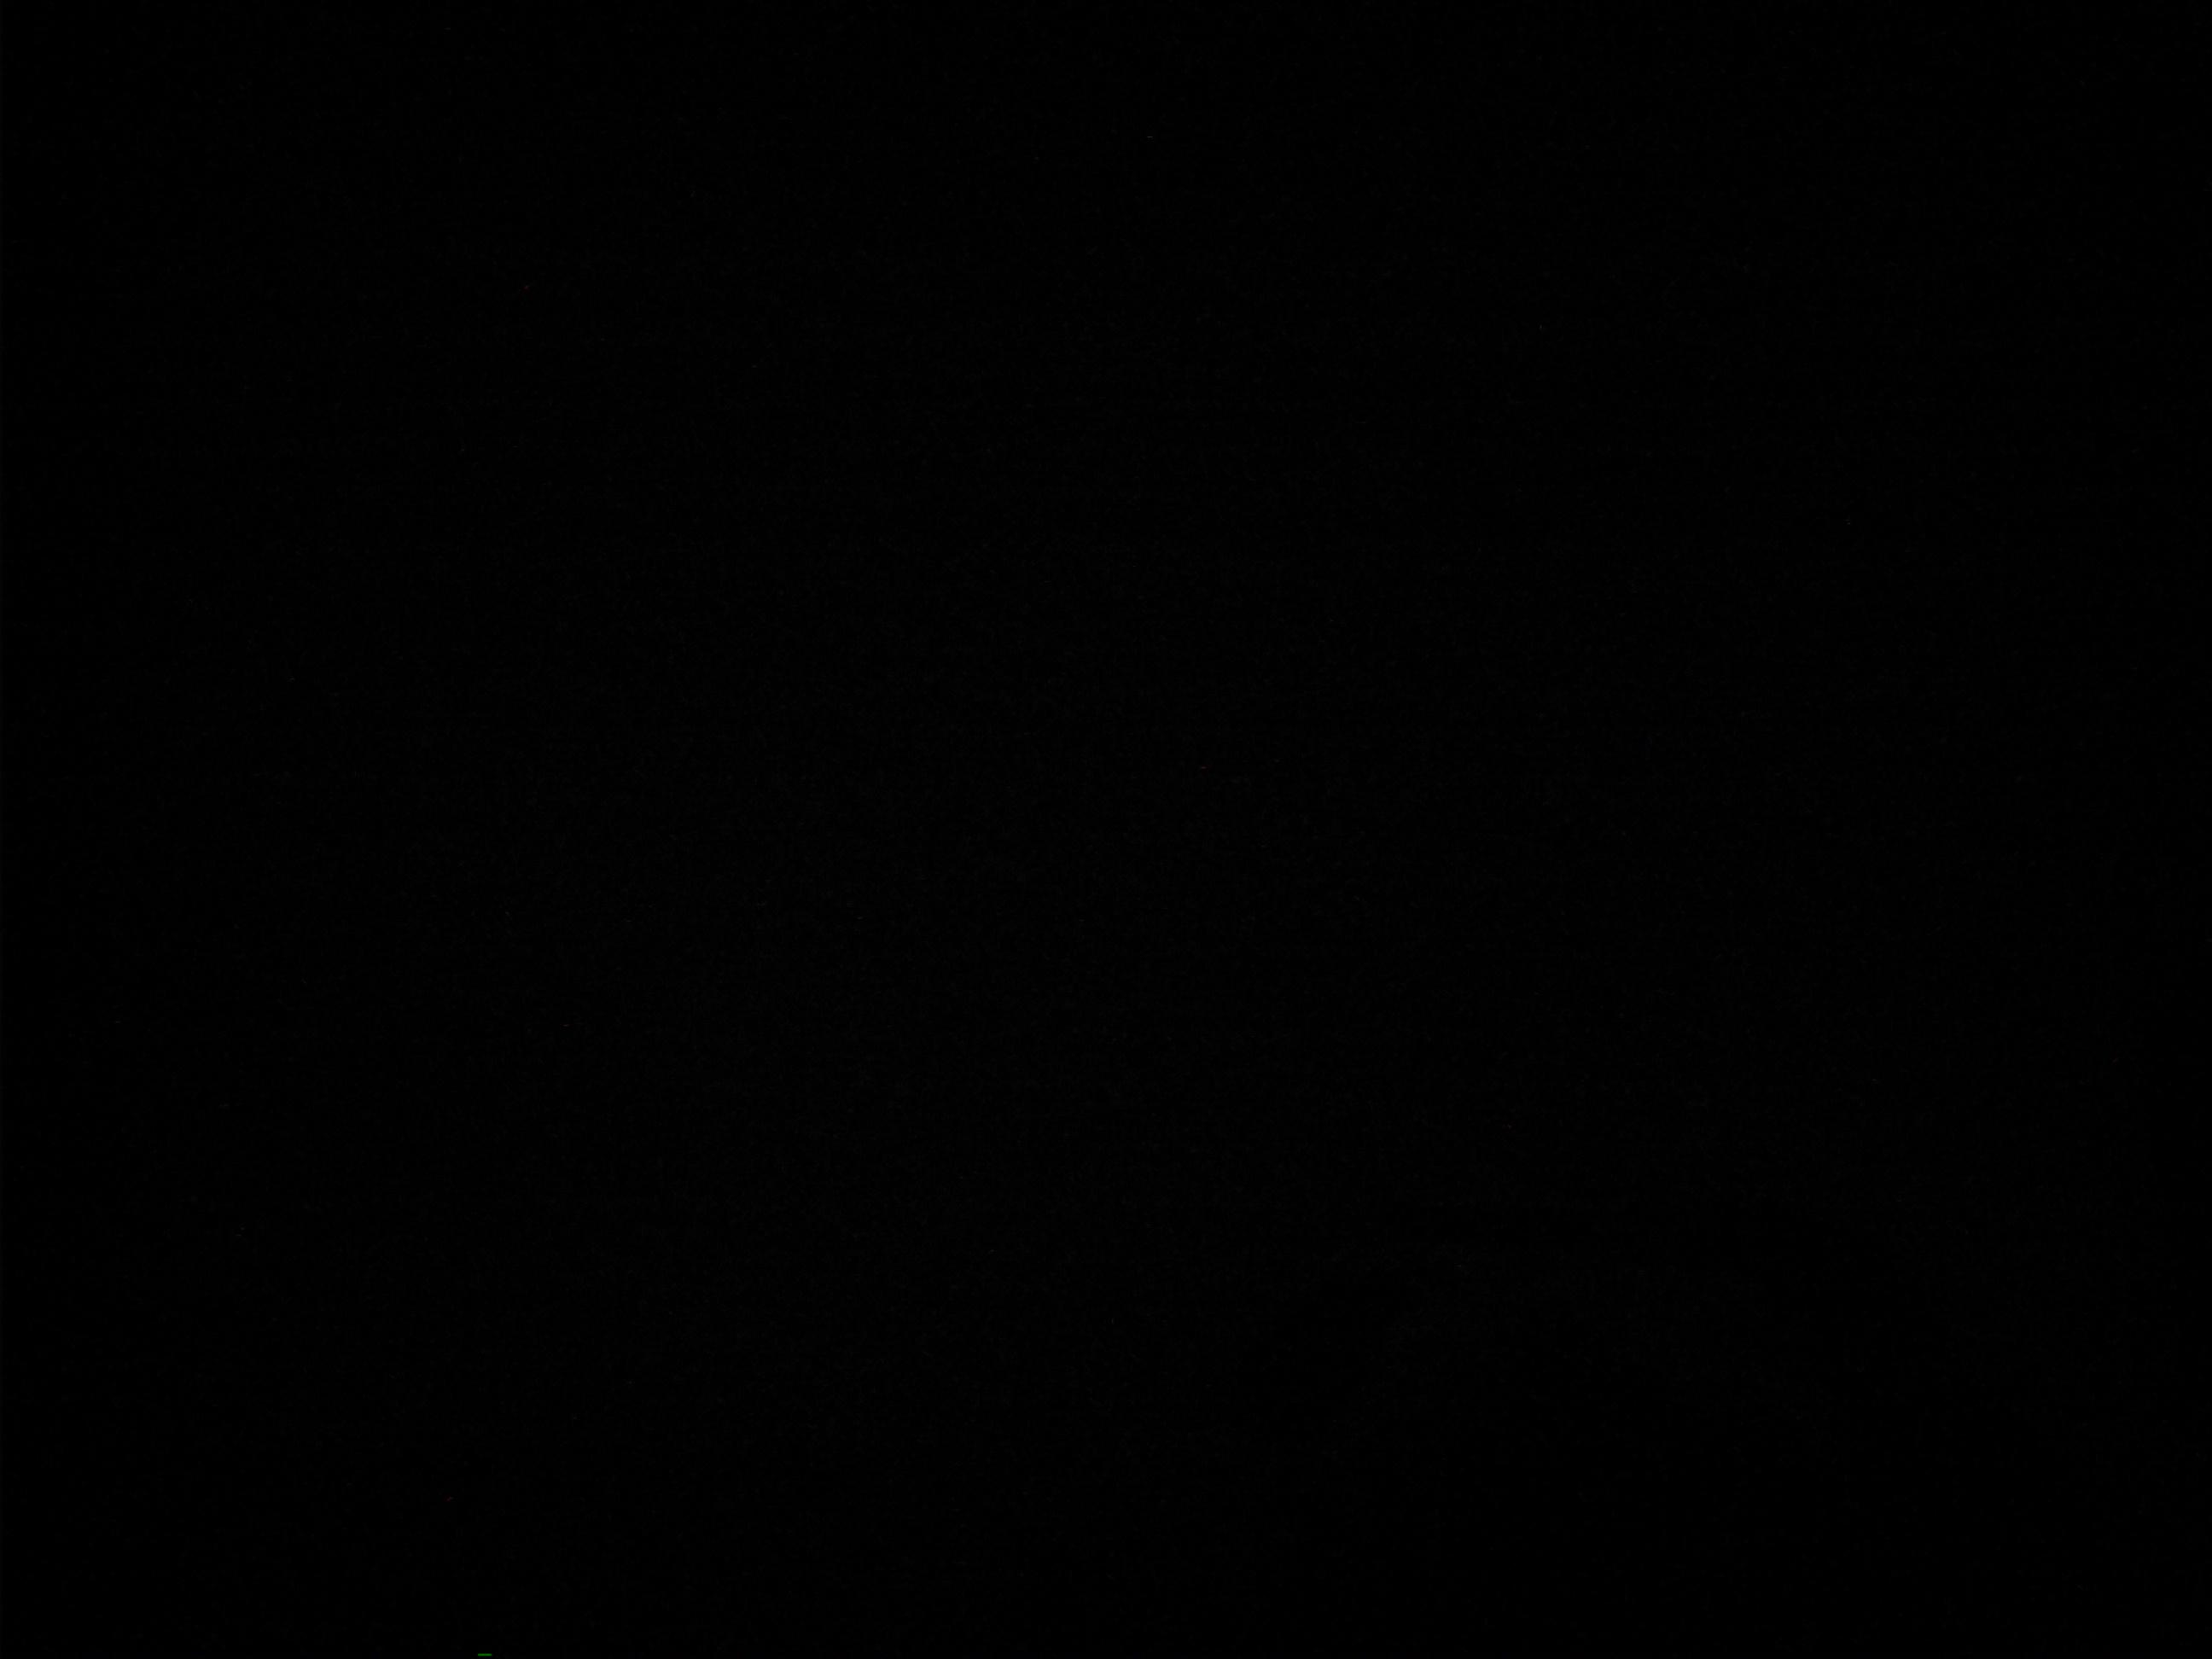 File:Black screen of the camera 2014-04-24 19-20.jpg - Wikimedia Commons